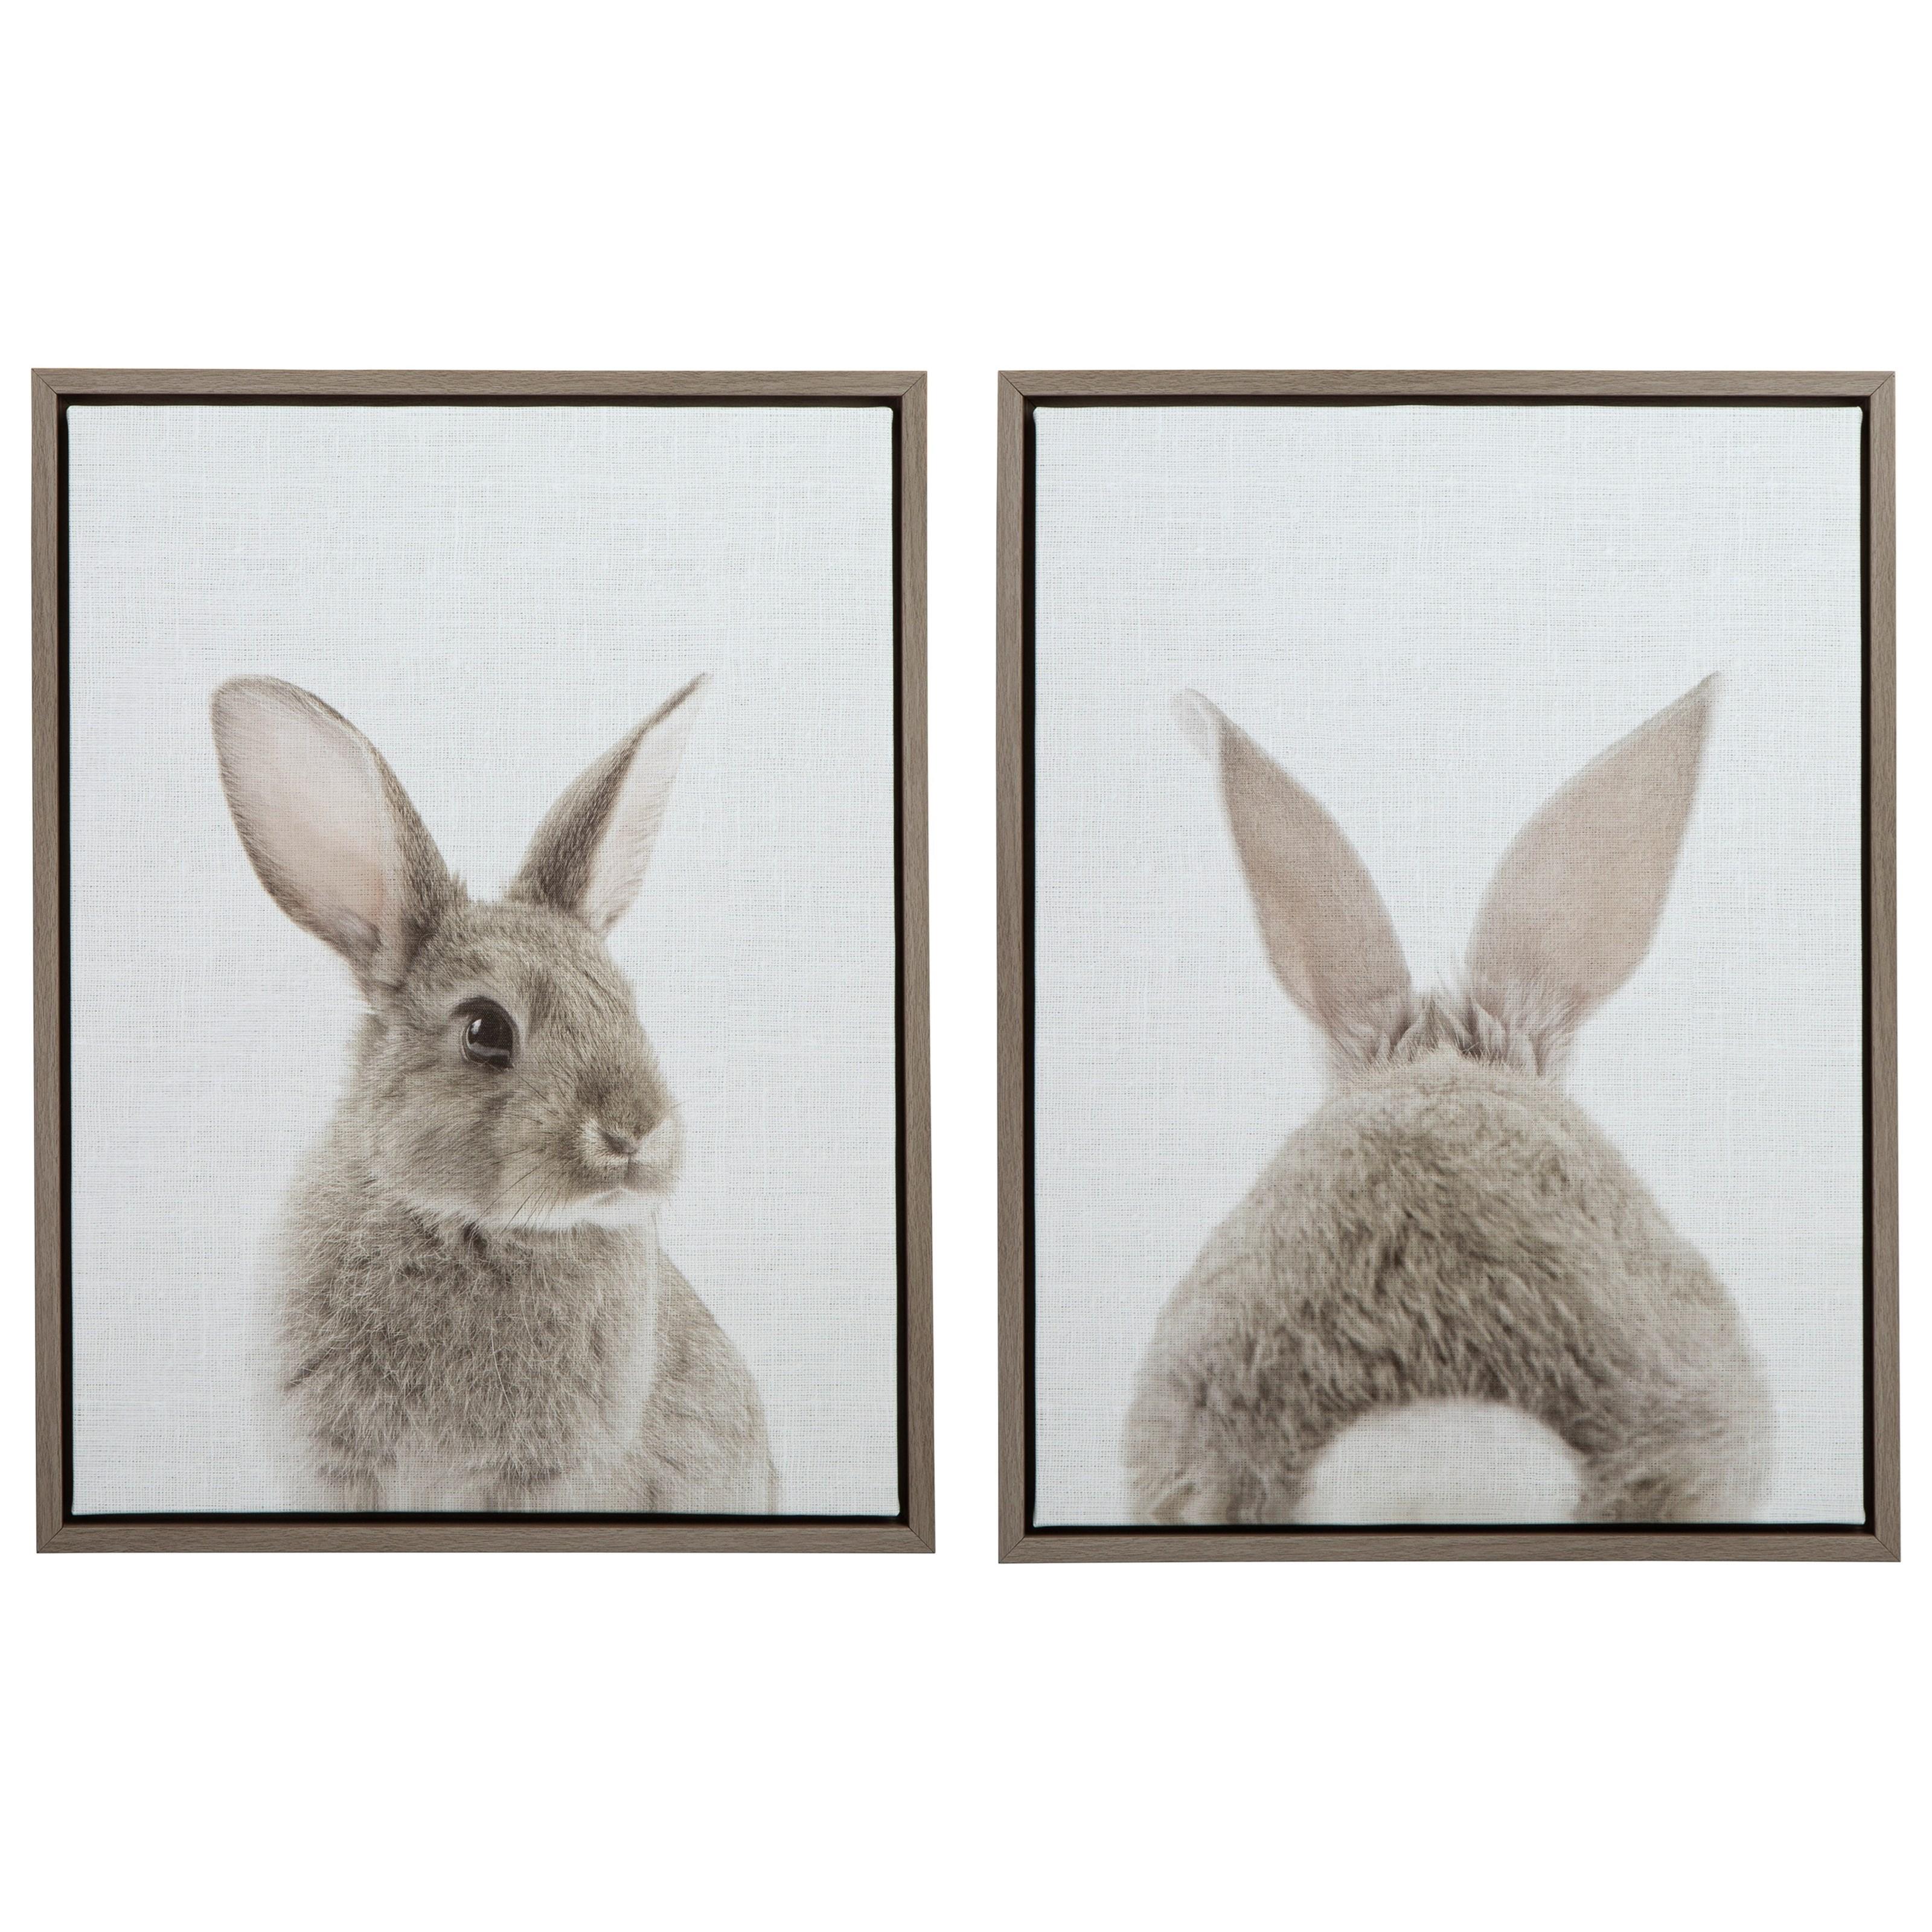 Wall Art Wittley Gray/Tan Bunnies Wall Art Set at Van Hill Furniture